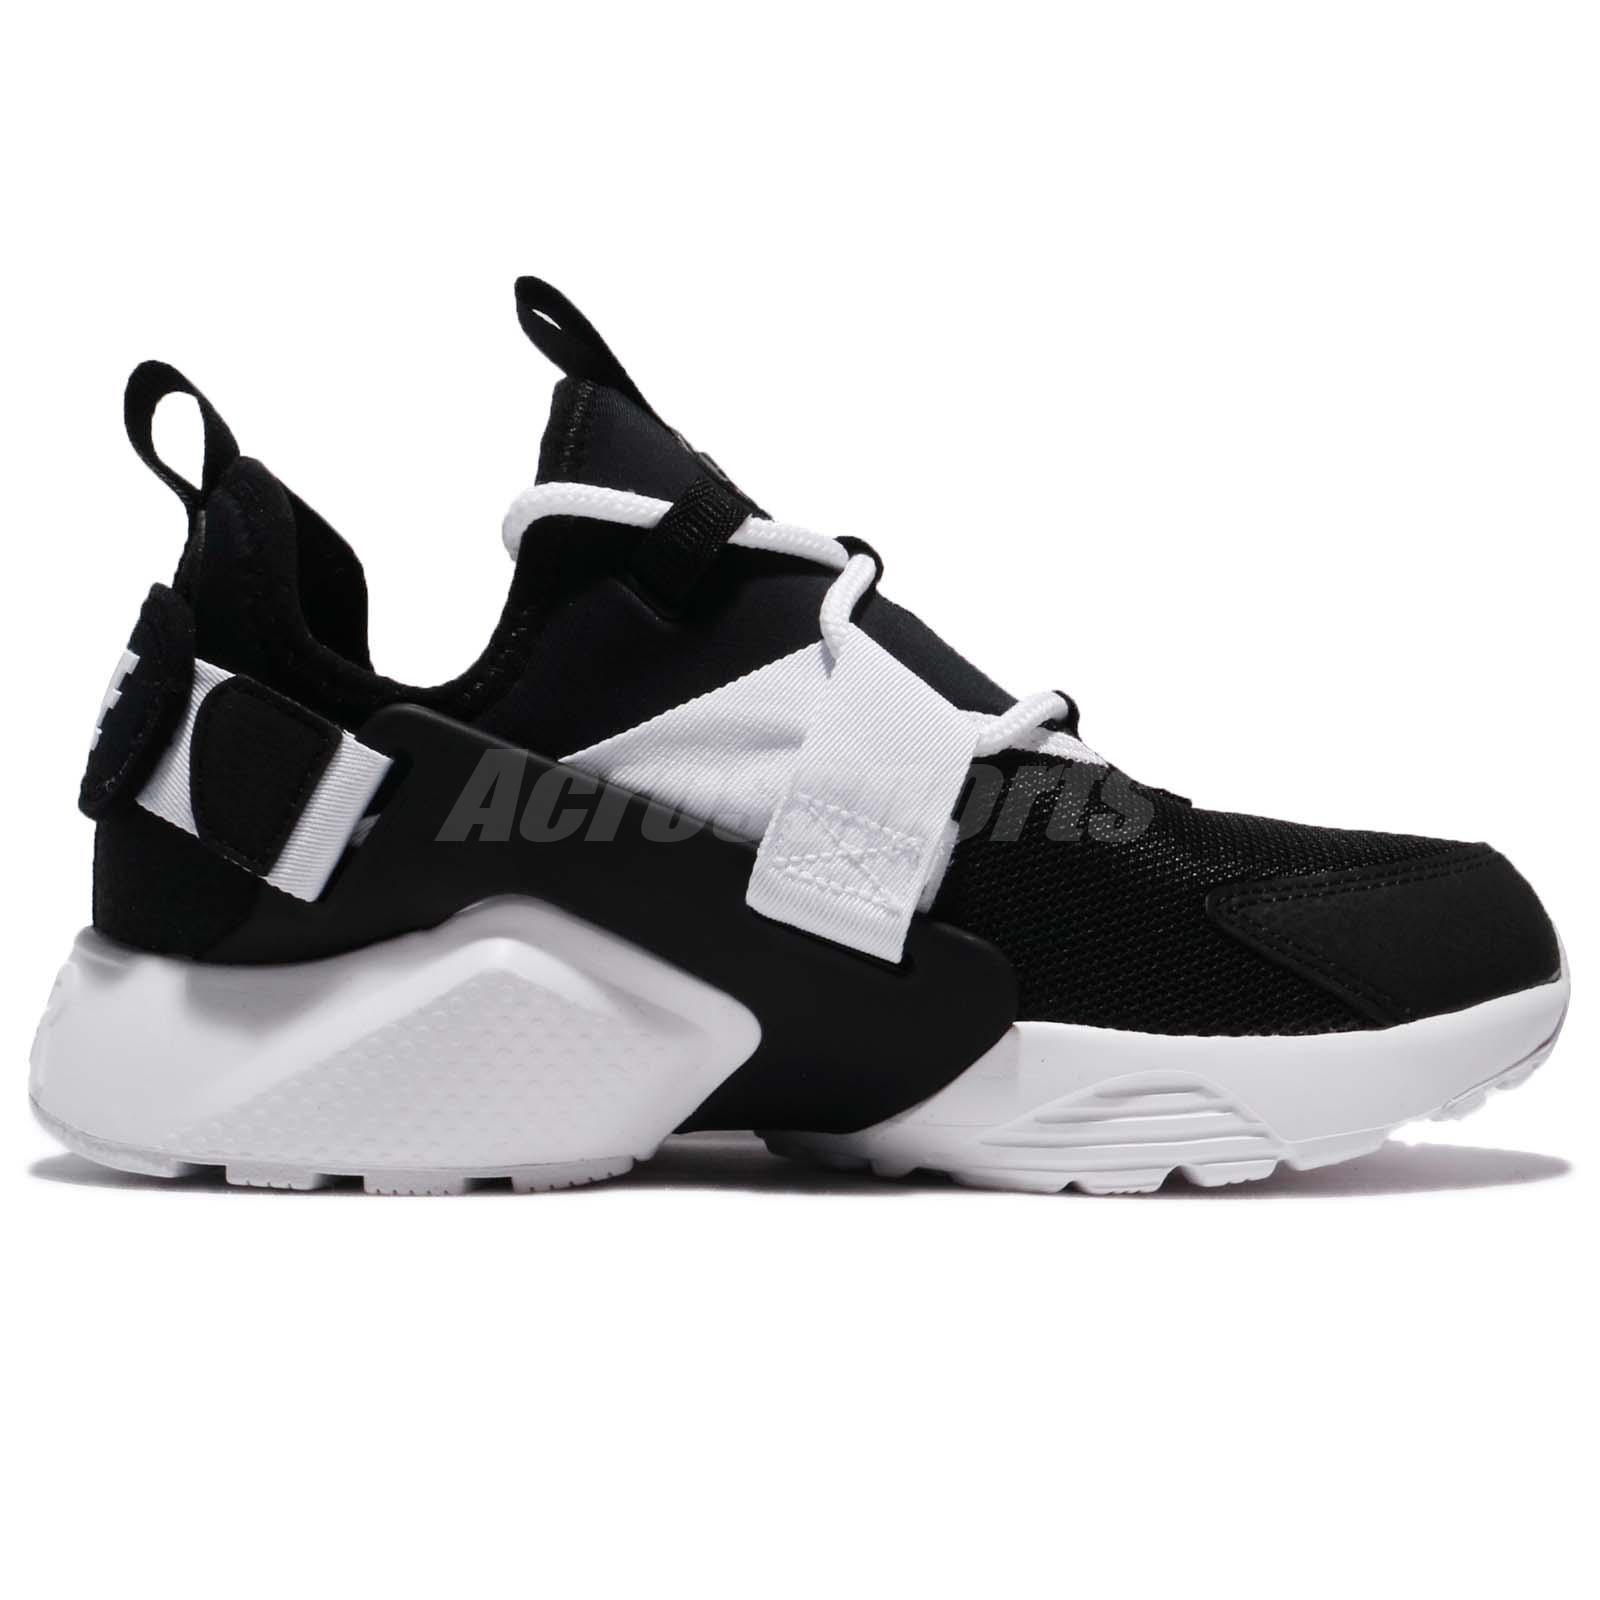 c1cb093afad51 Nike Wmns Air Huarache City Low Black White Women Running Shoes ...